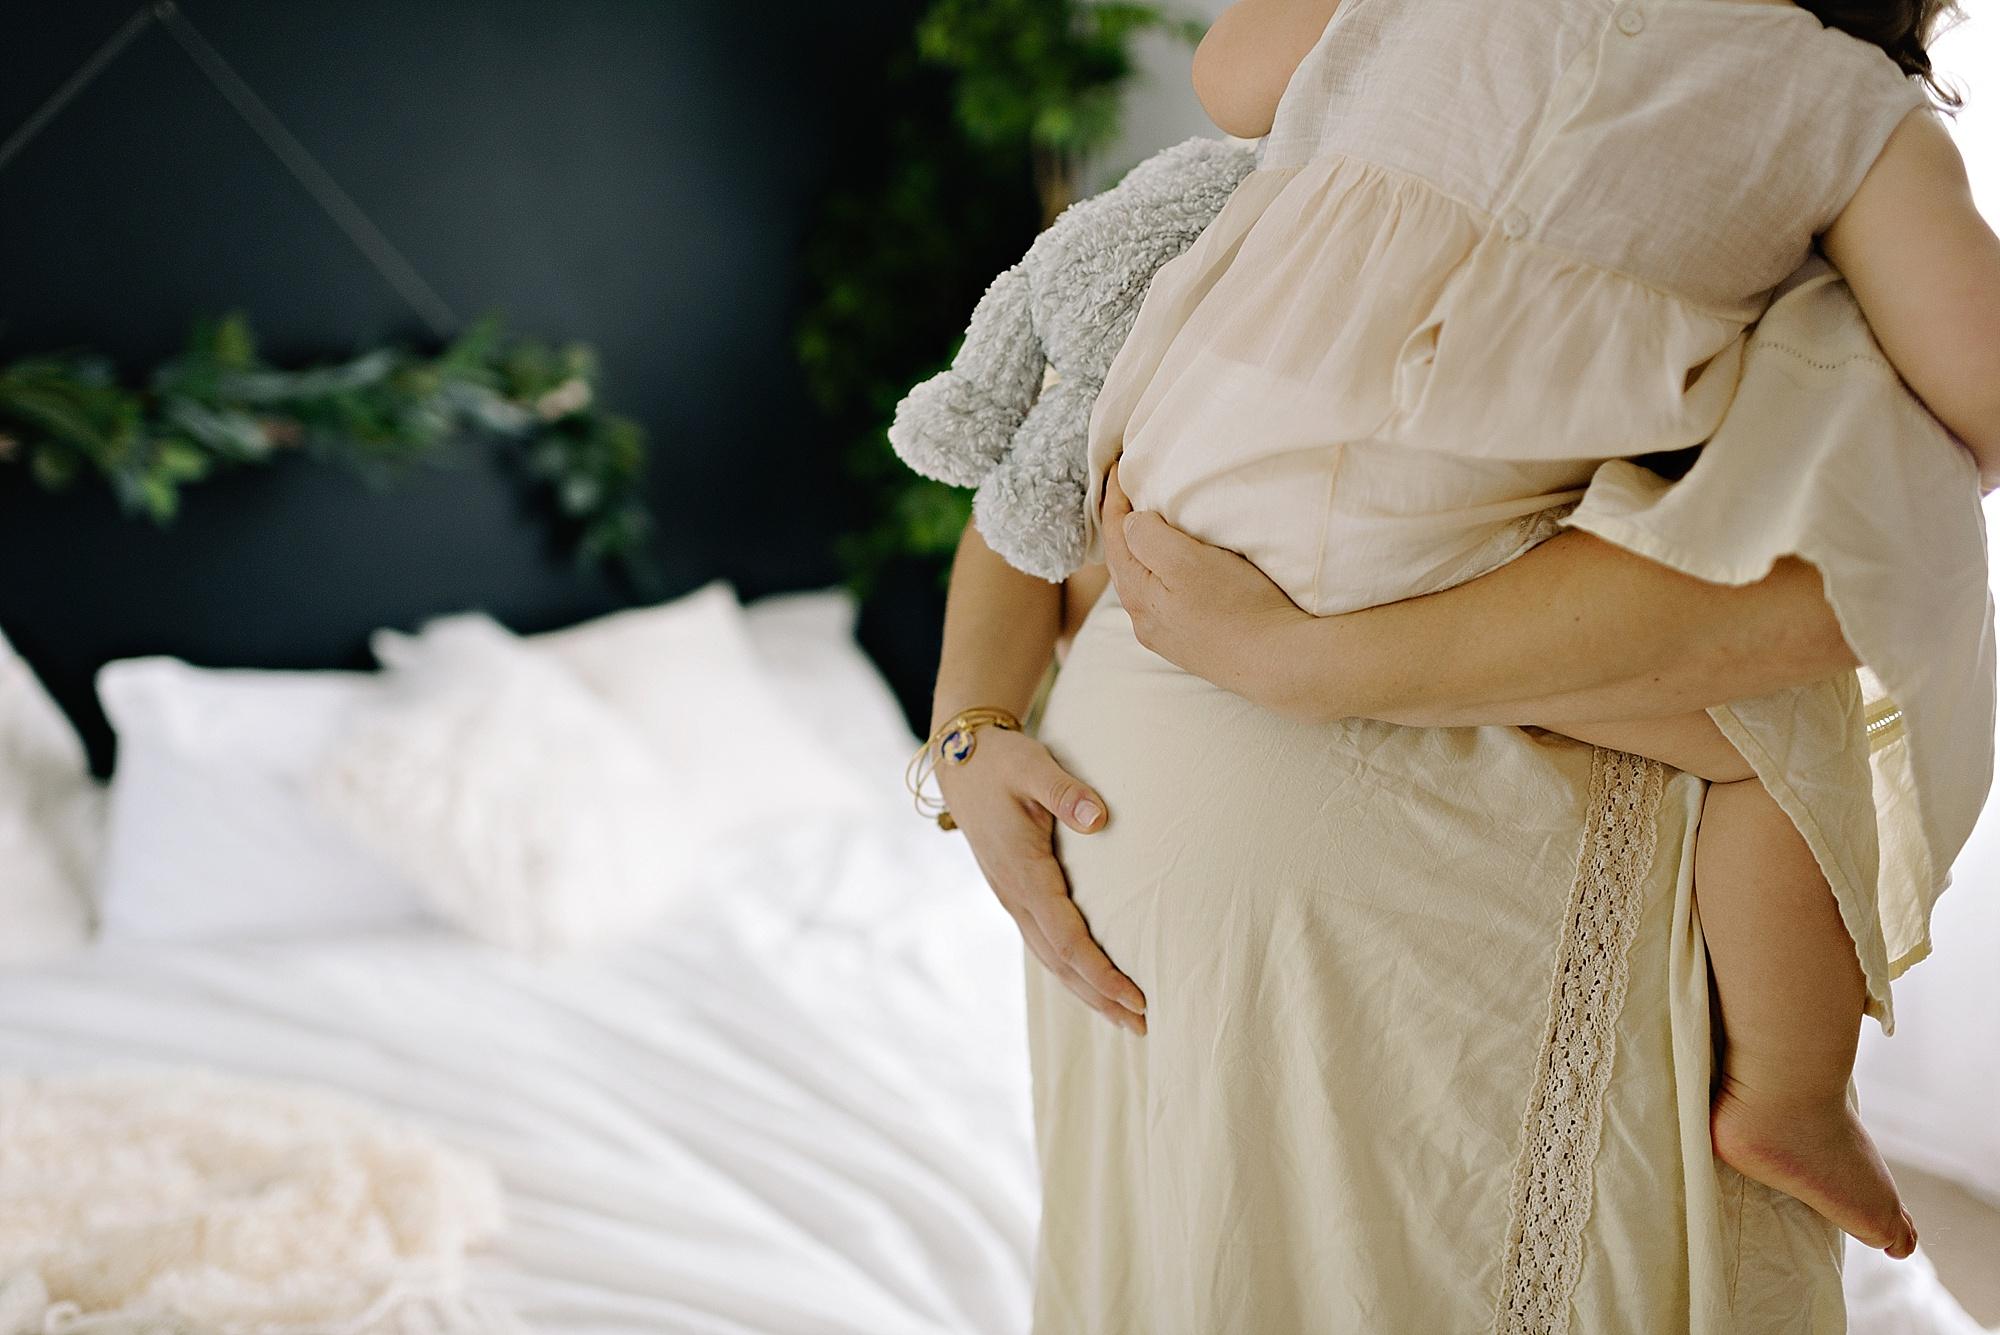 lauren-grayson-photography-cleveland-ohio-photographer-momm-and-me-studio-photo-shoot_0666.jpg